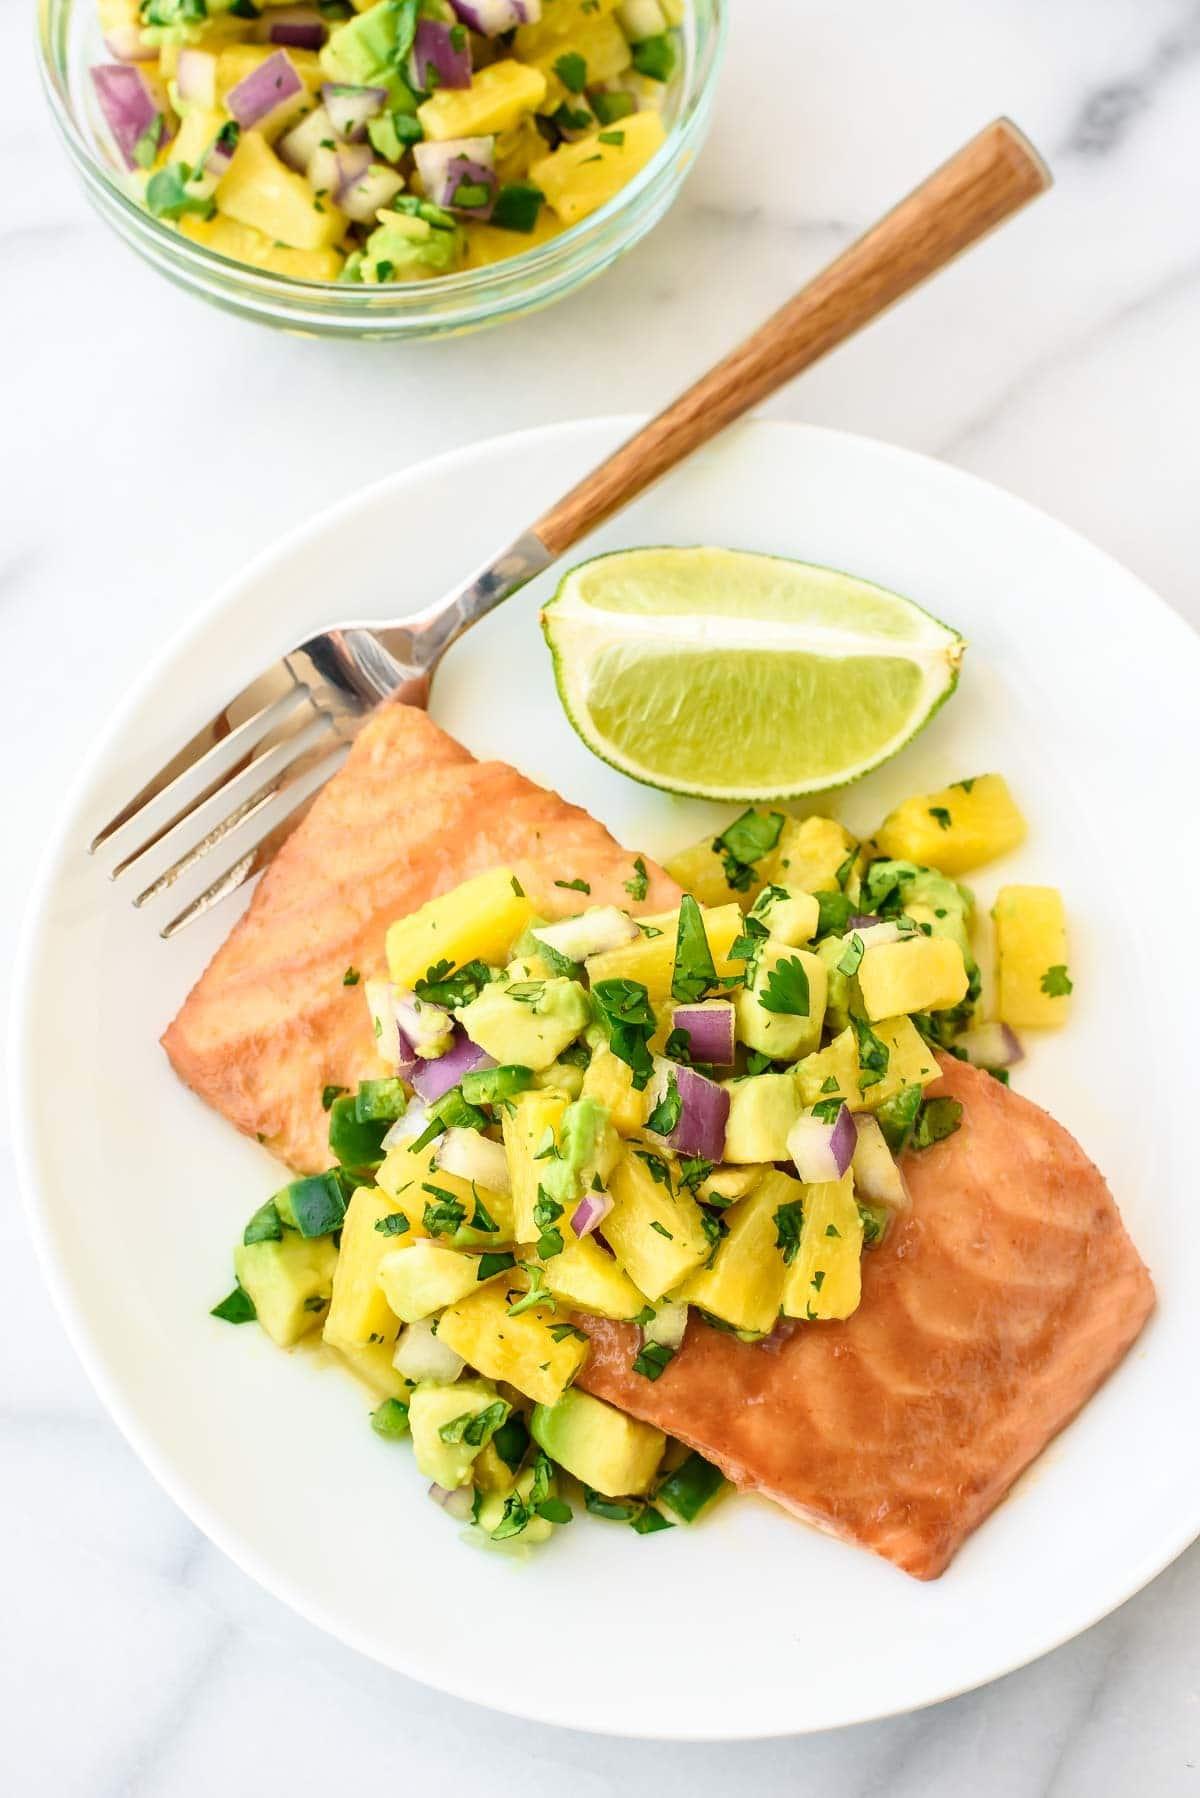 Pineapple Glazed Salmon with Avocado Salsa